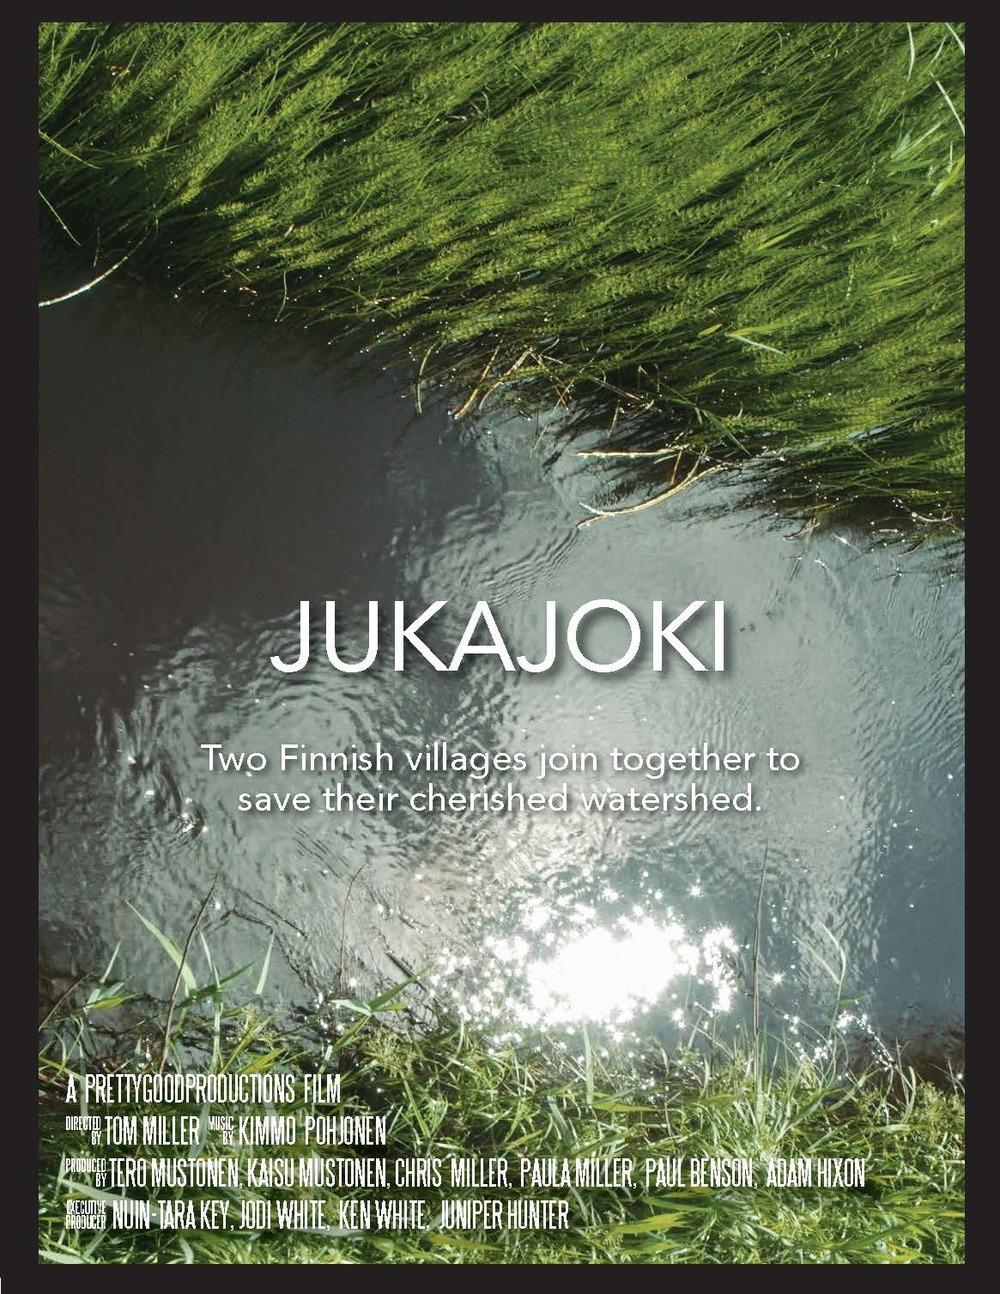 Jukajoki poster